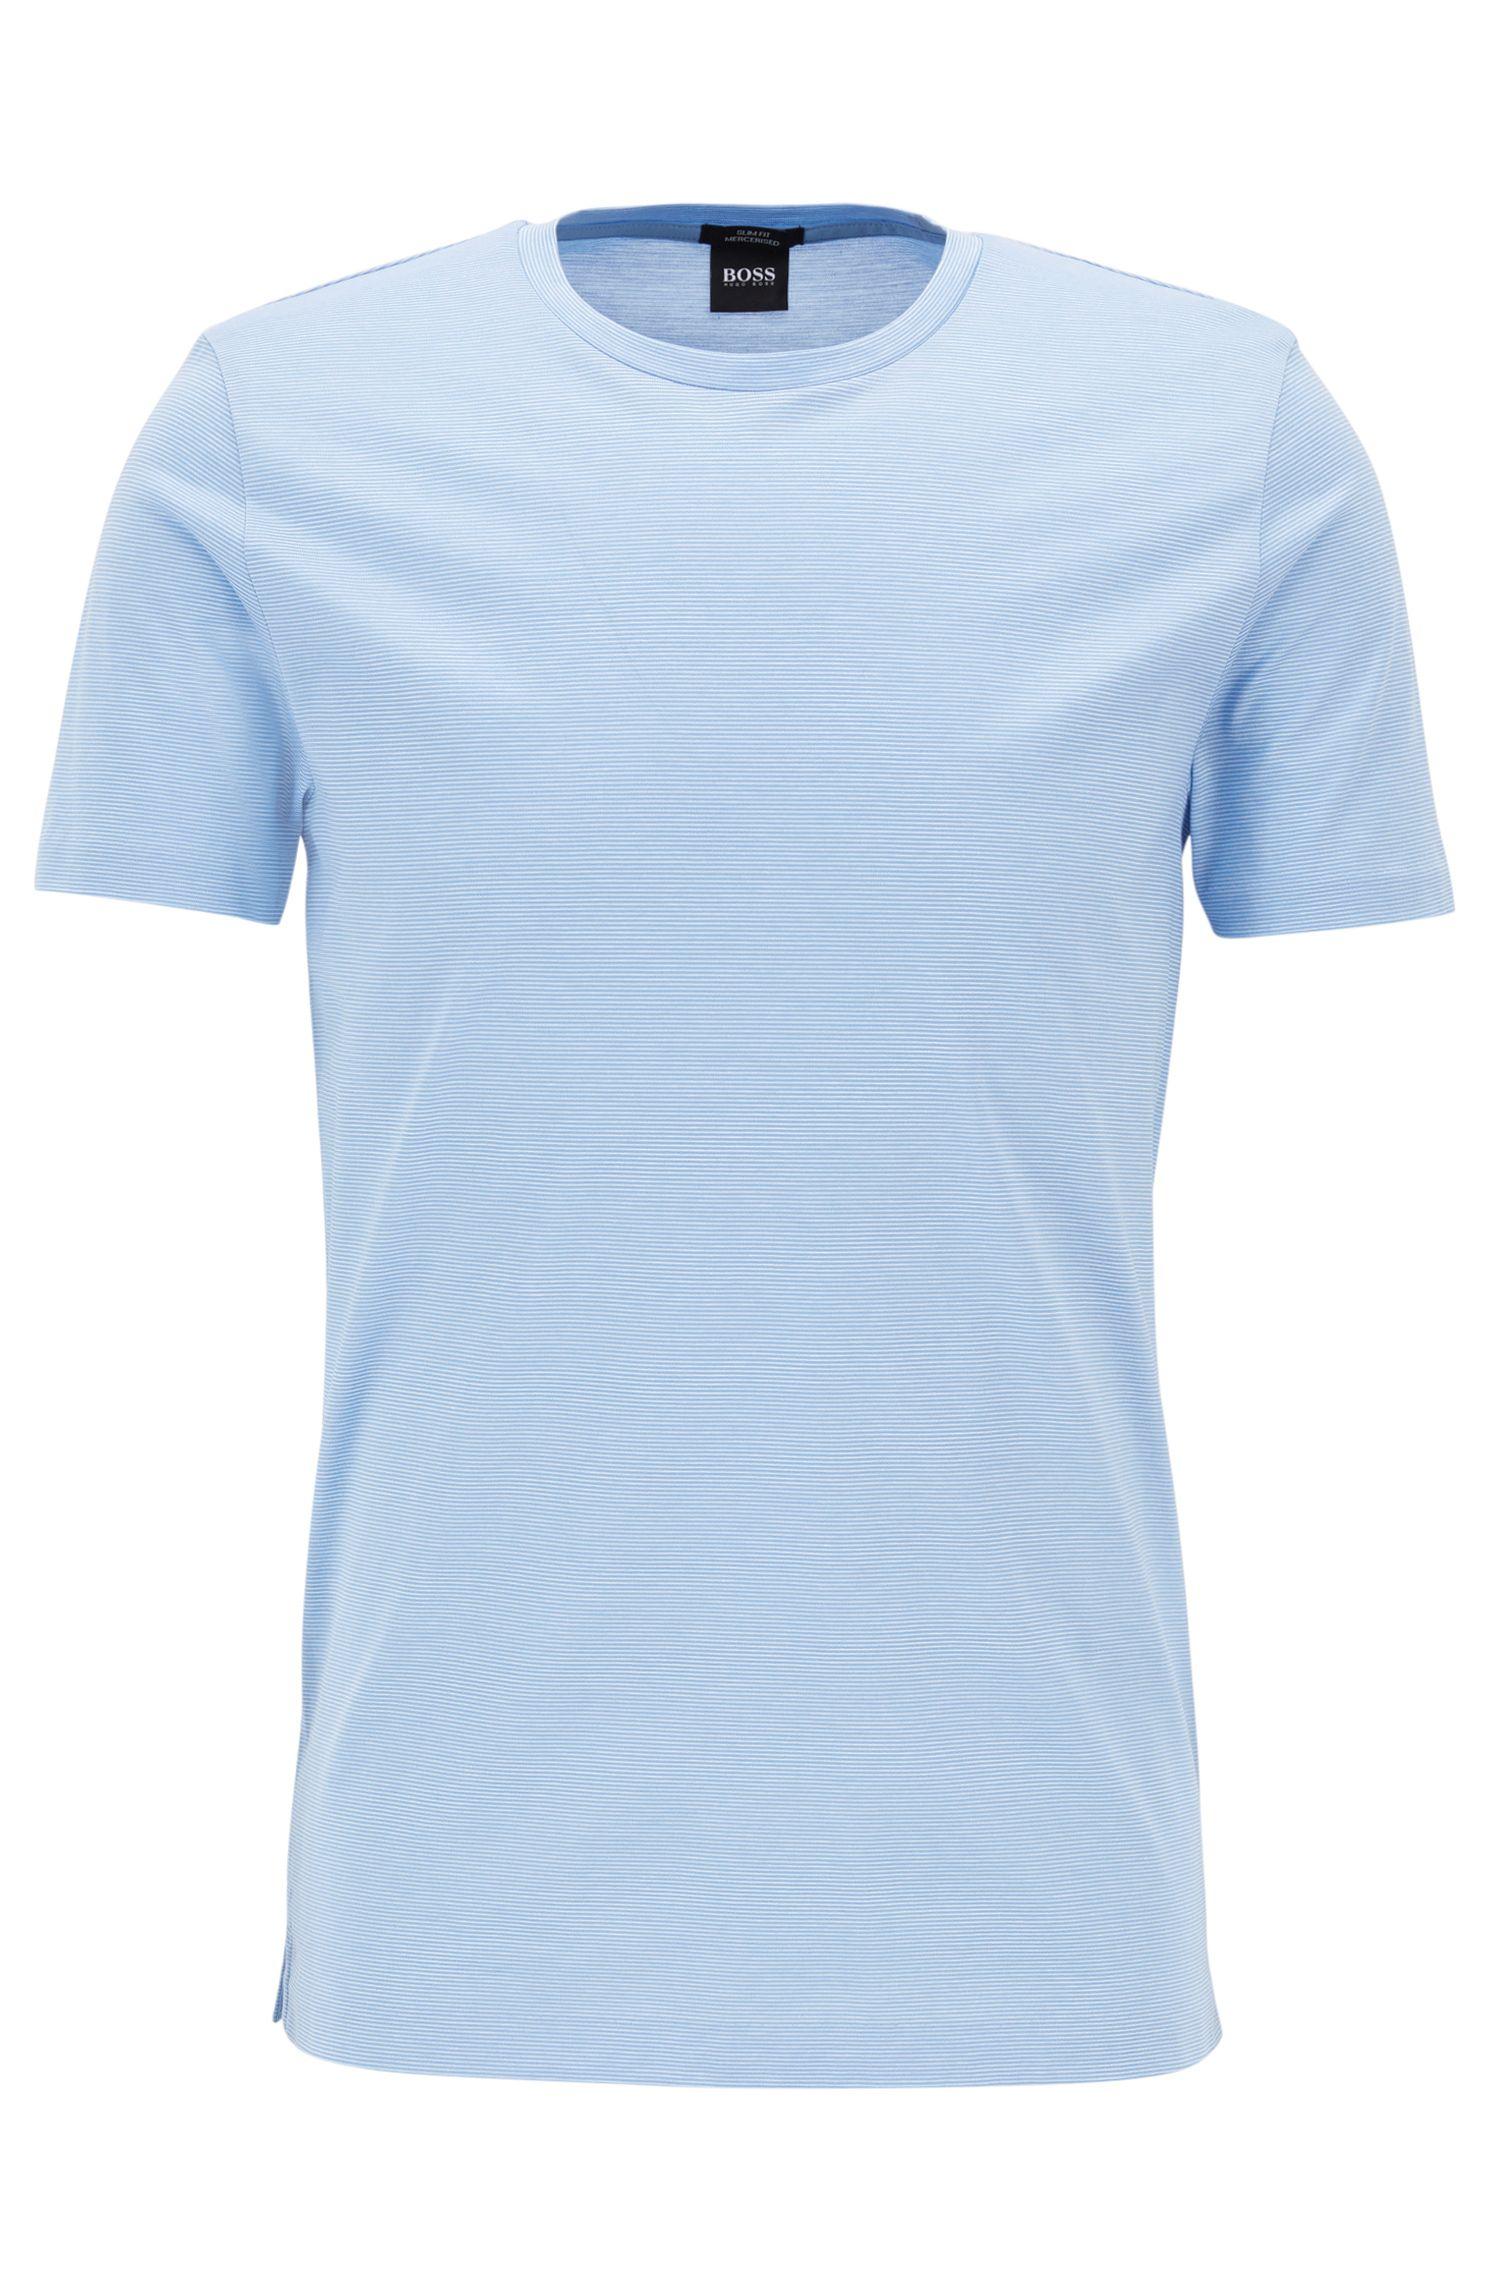 Slim-fit T-shirt in mercerised cotton